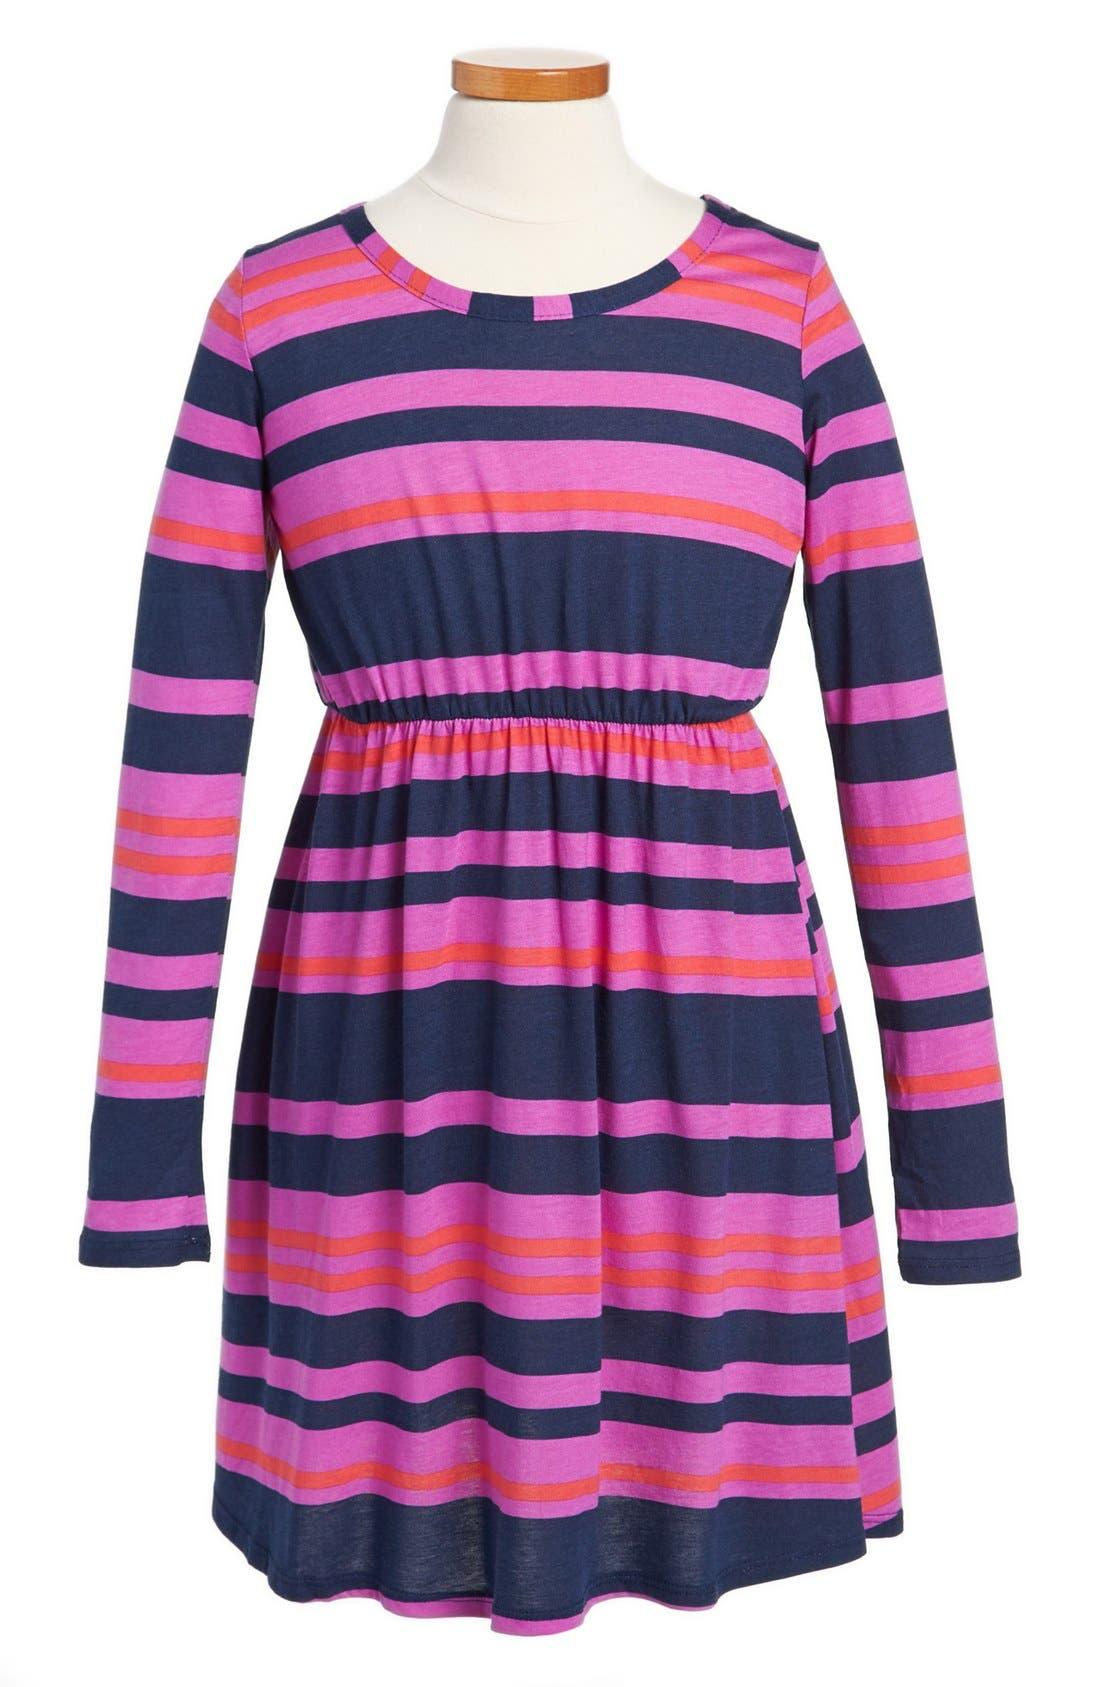 Main Image - Splendid Striped Dress (Big Girls)